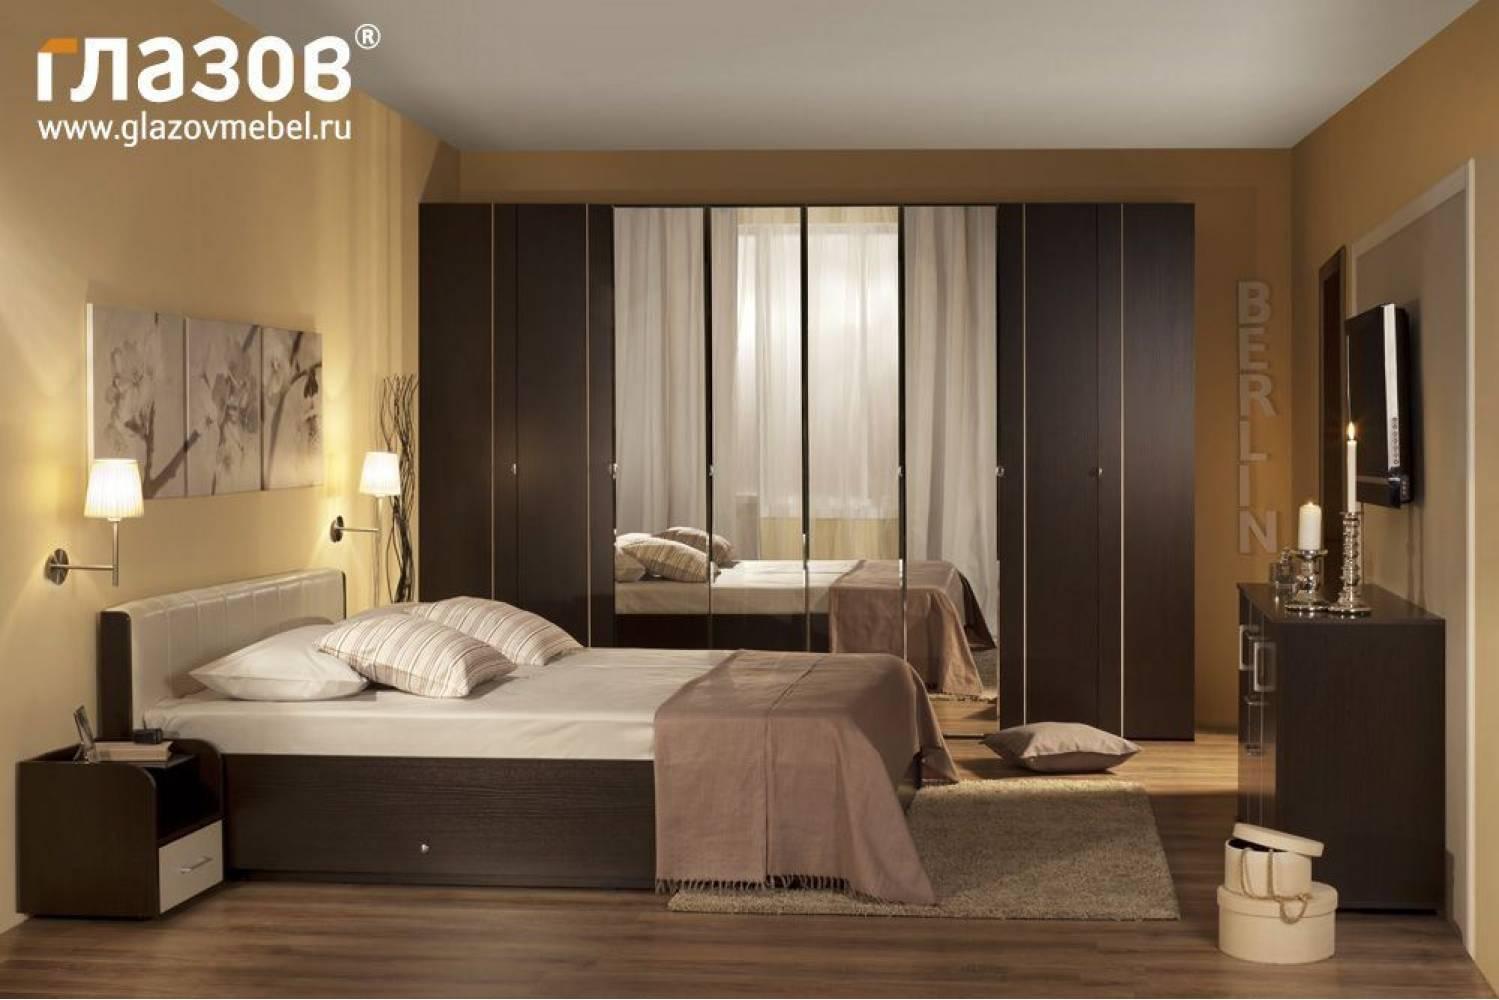 Спальня BERLIN (Берлин) Венге. Комплект 1